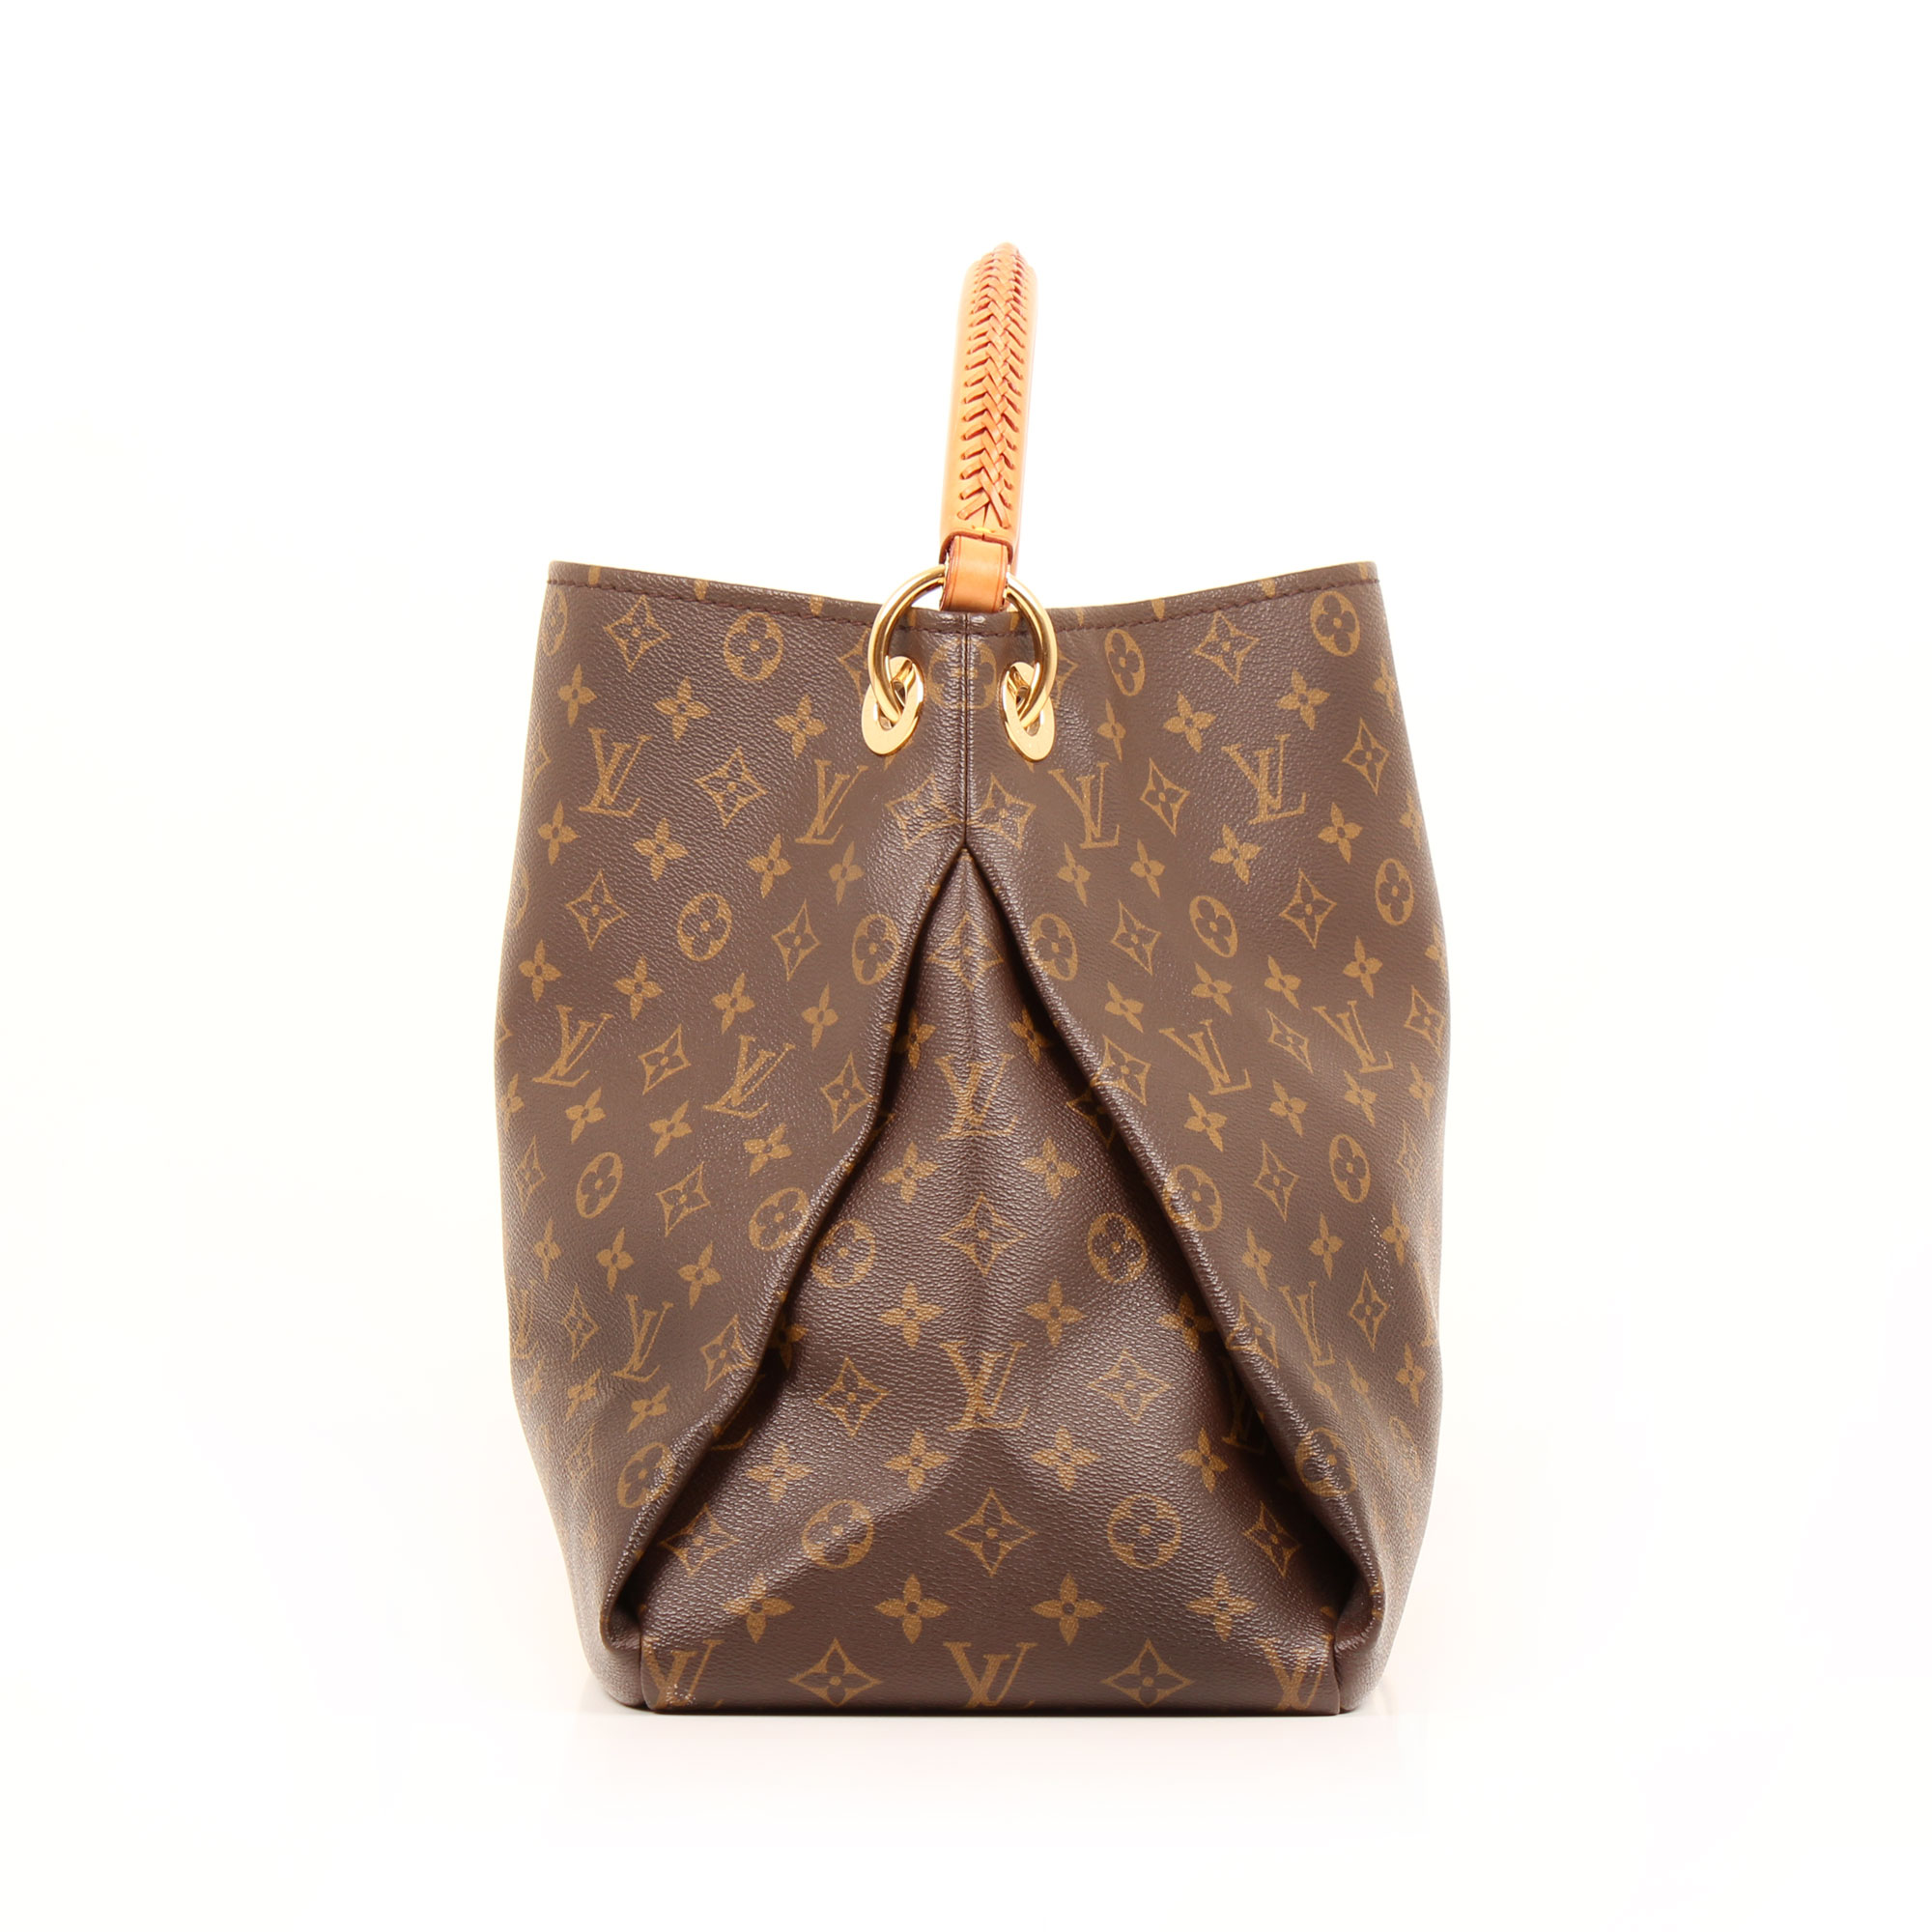 Imagen lateral del bolso louis vuitton artsy monogram mm